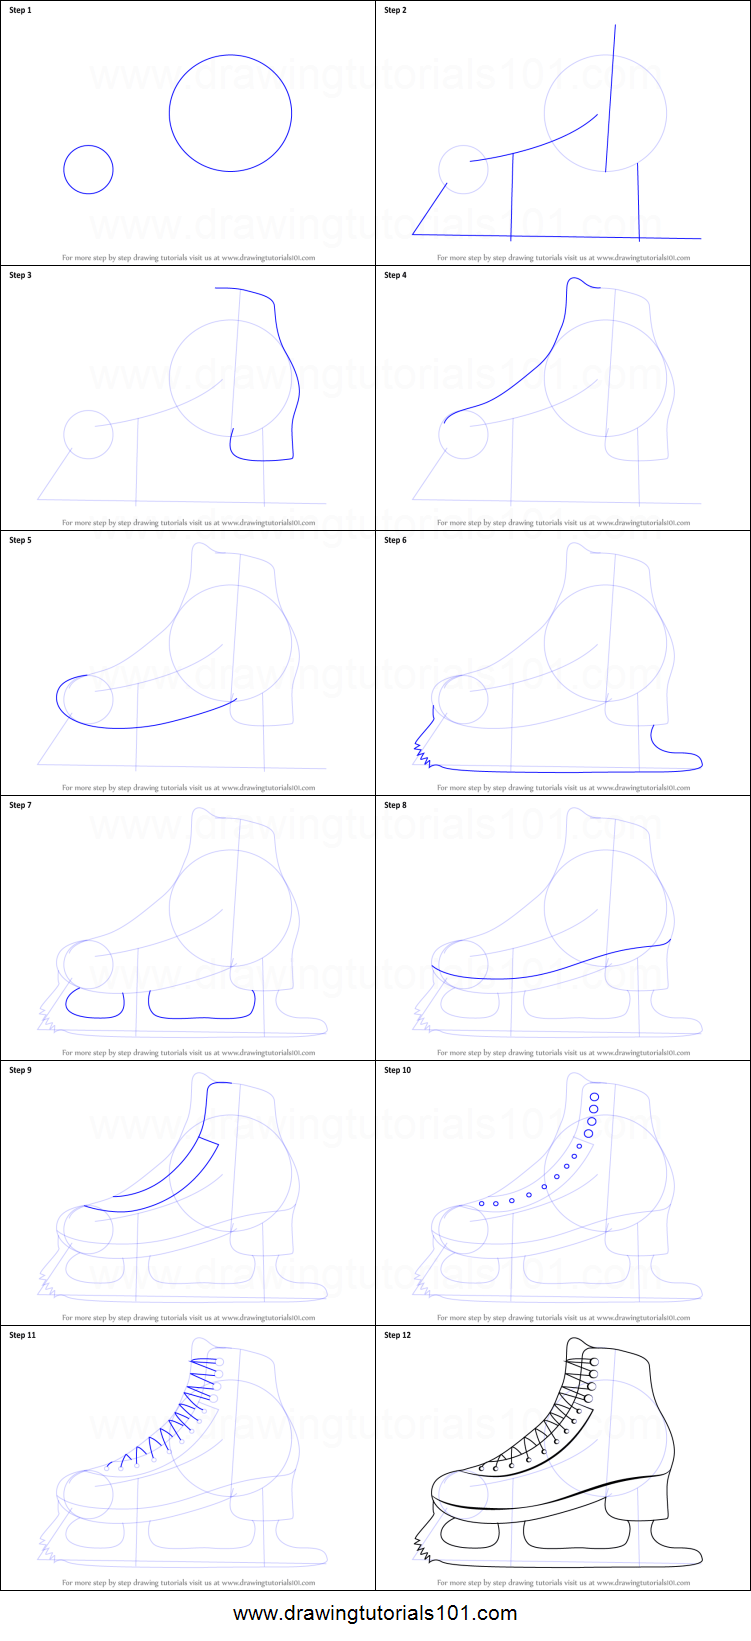 How To Draw Ice Skates : skates, Skates, Printable, Drawing, Sheet, DrawingTutorials101.com